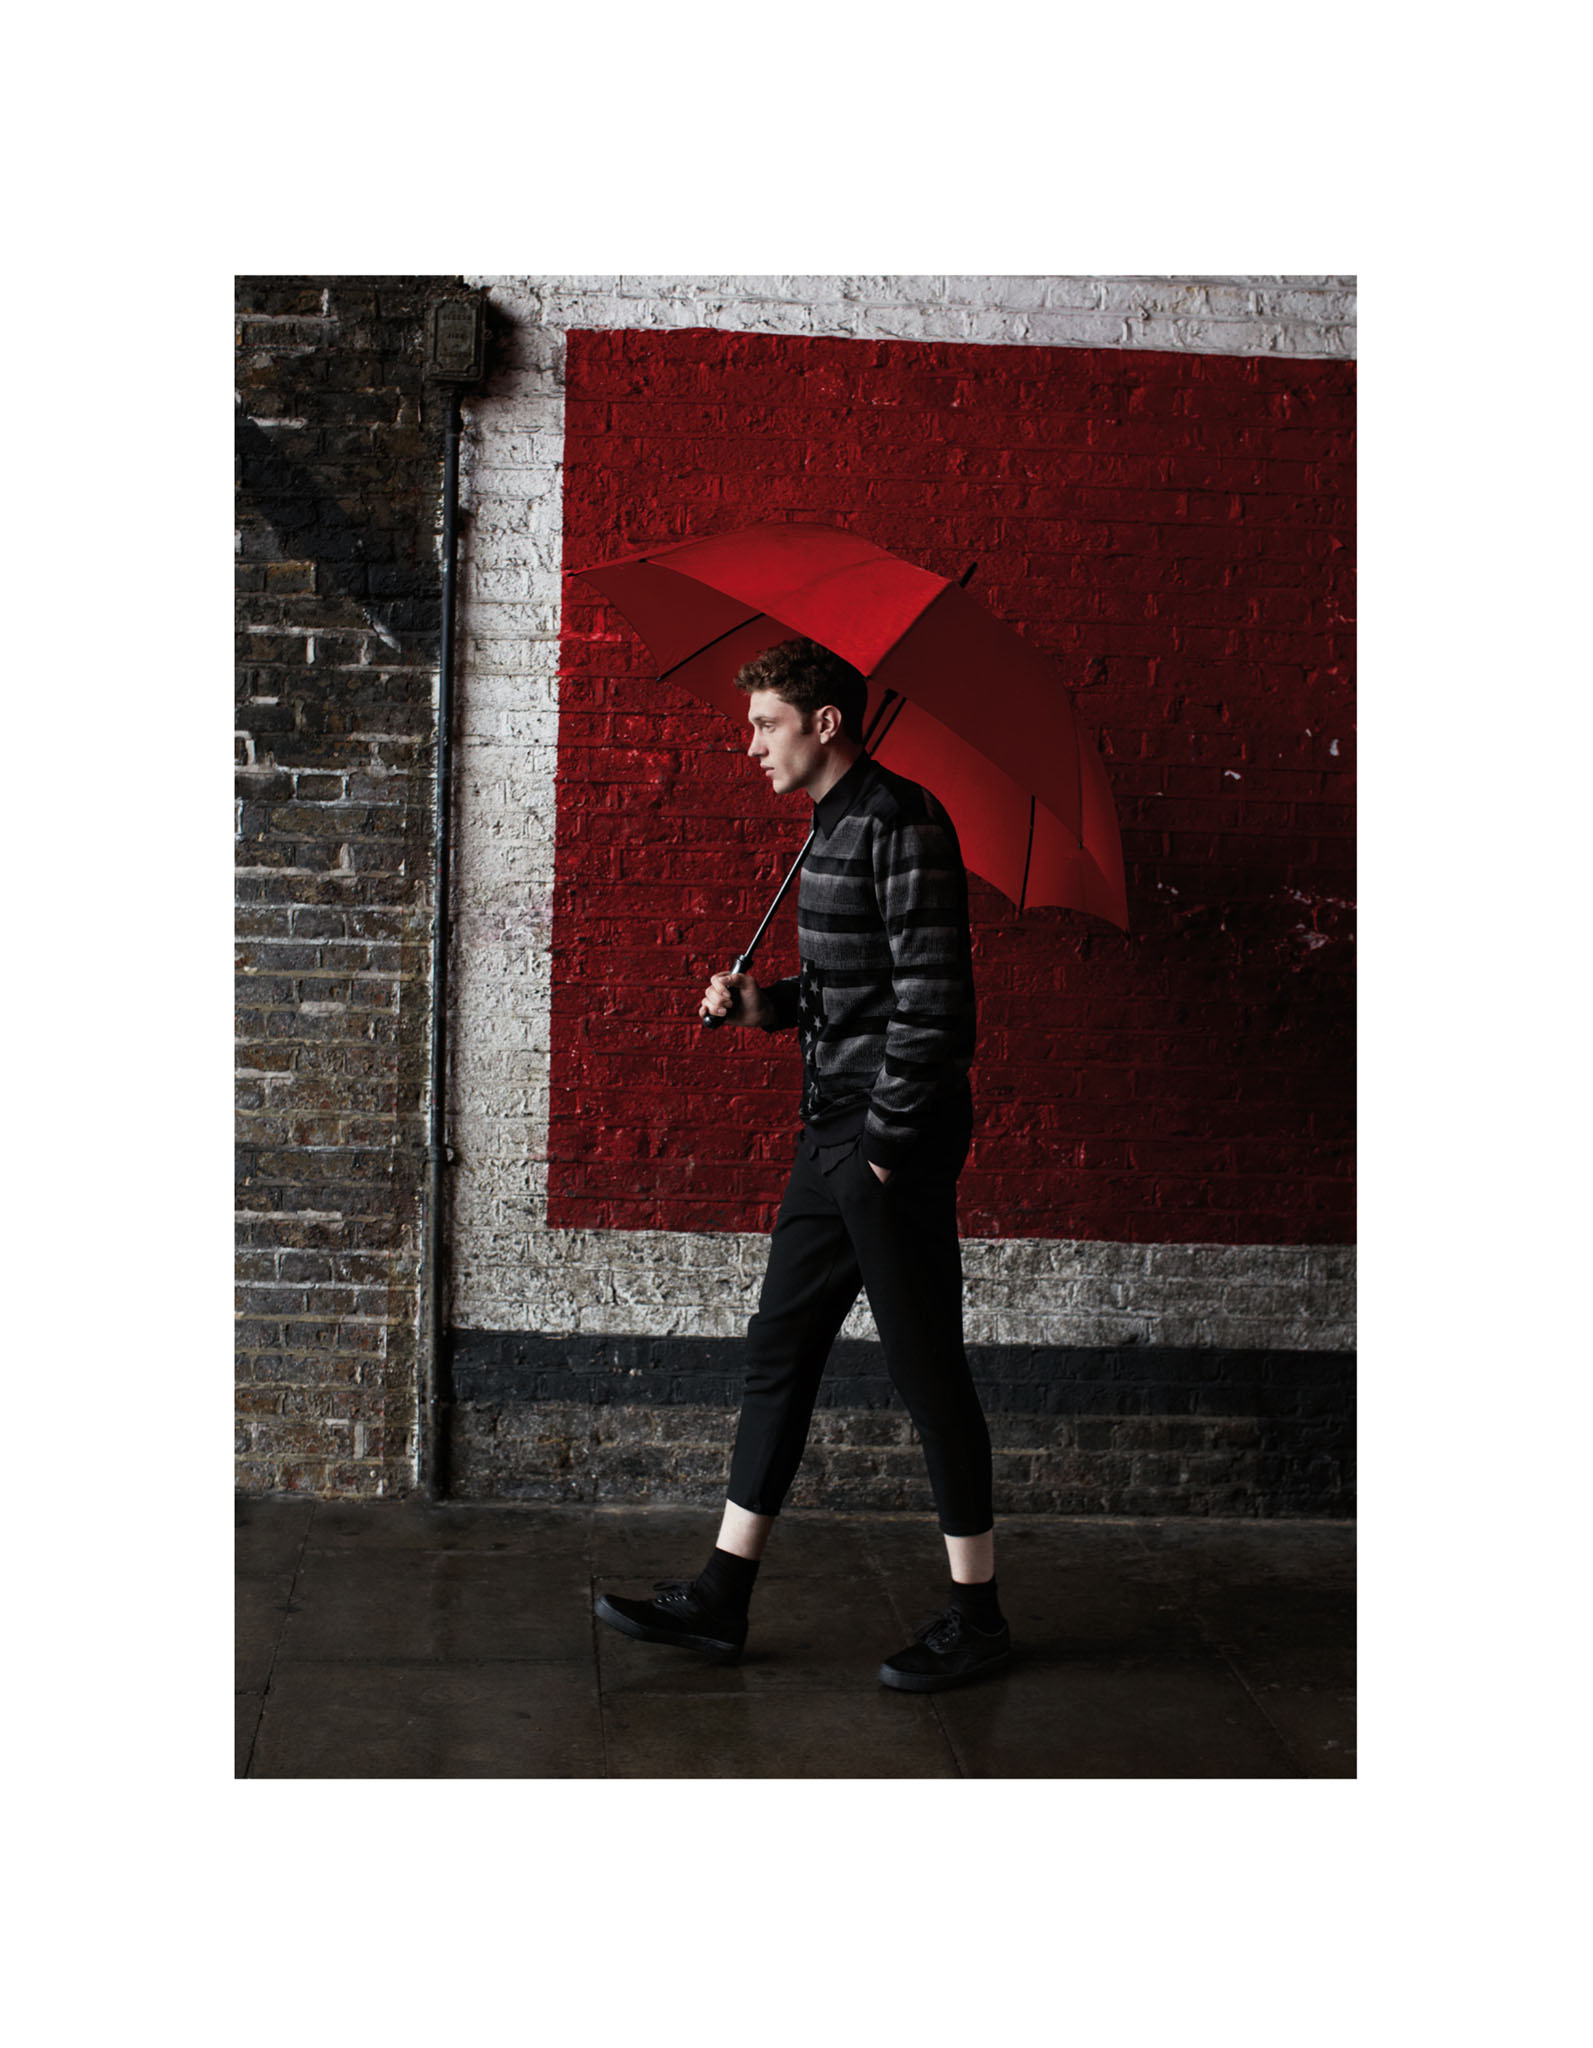 PRINTEMPS Catalogue Homme London Mania. Mode Homme Givenchy, Alexander Wang